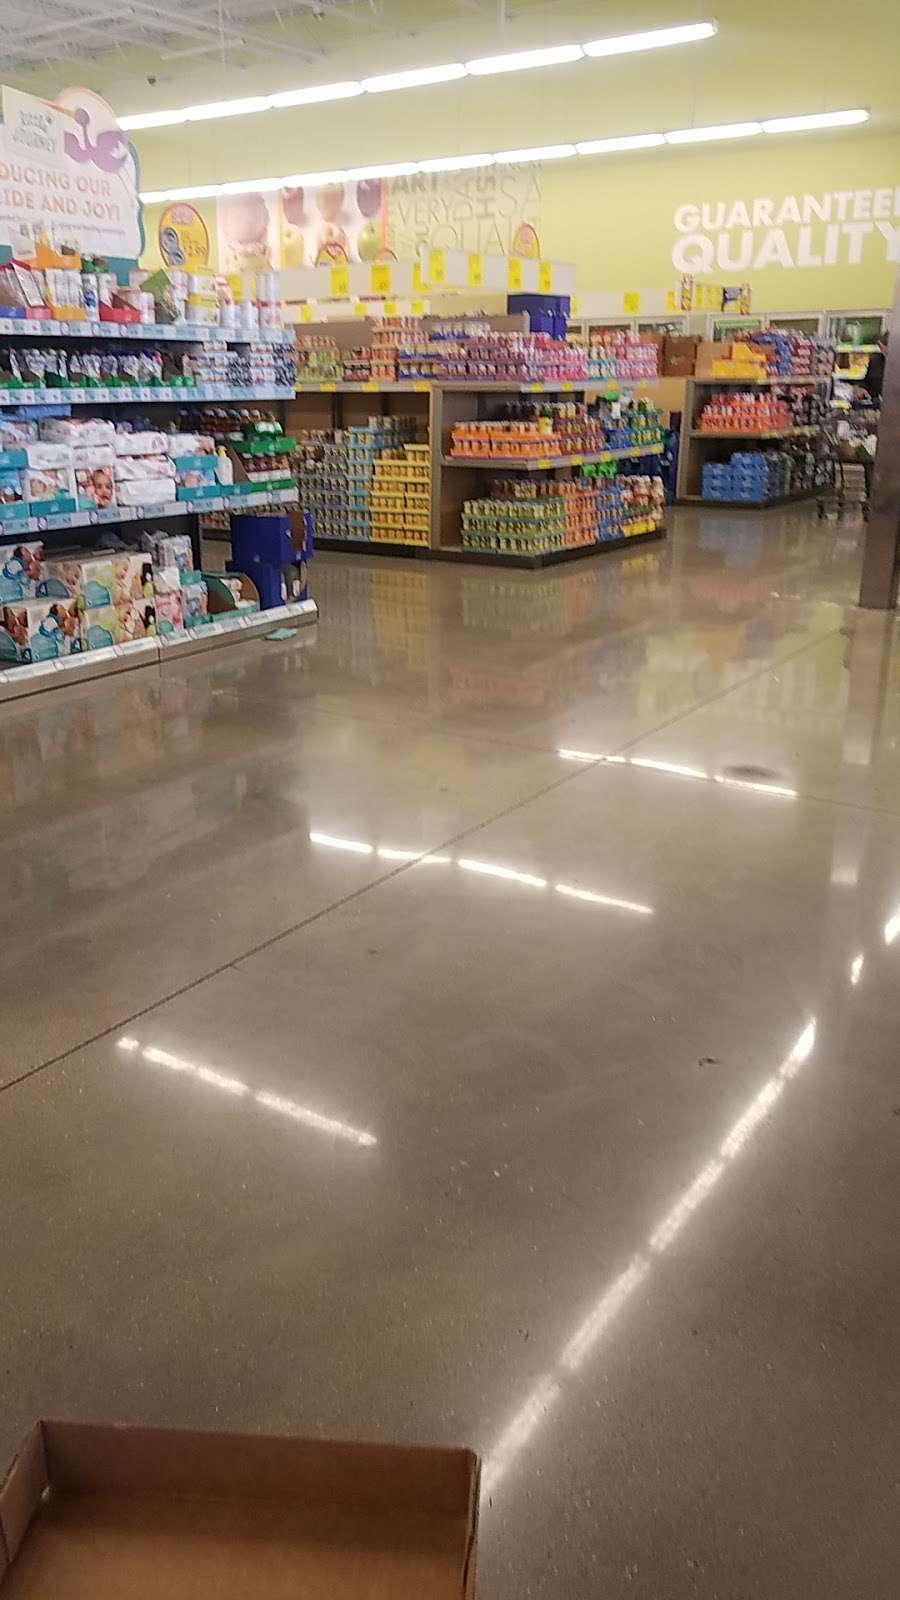 ALDI - supermarket  | Photo 9 of 10 | Address: 1038 N Rohlwing Rd, Addison, IL 60101, USA | Phone: (855) 955-2534